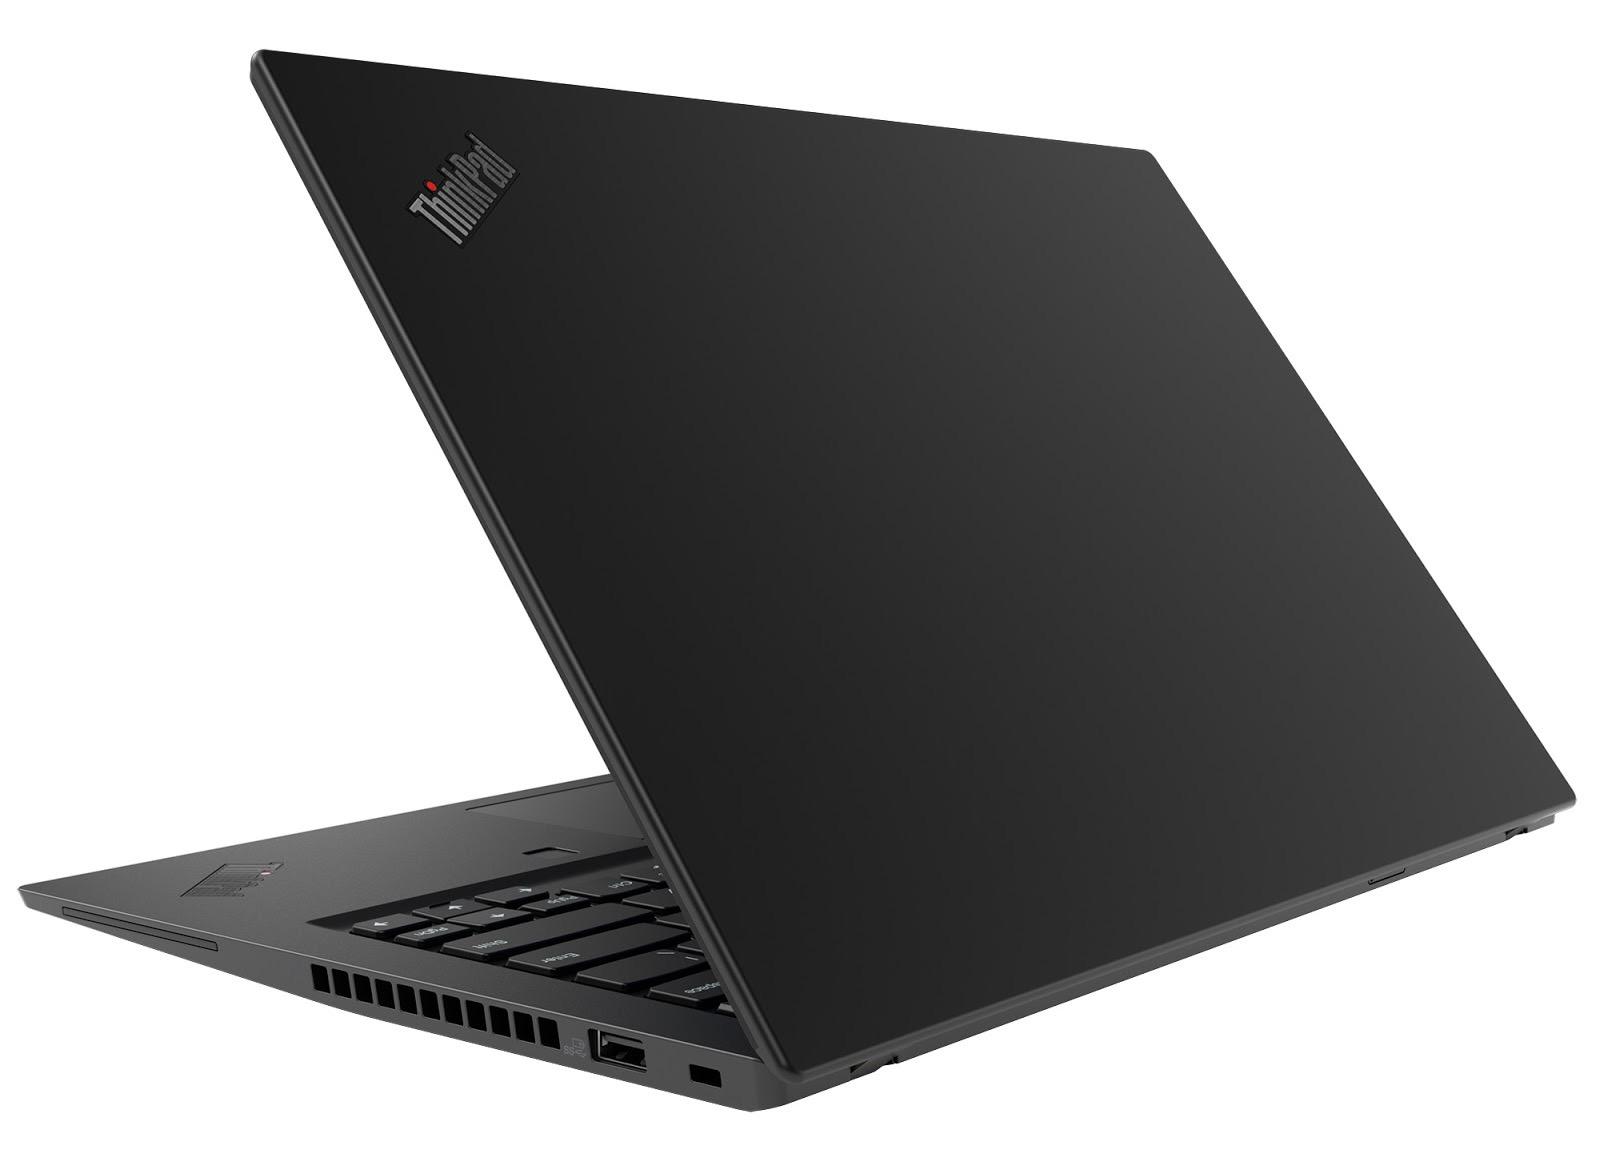 Фото 1. Ноутбук Lenovo ThinkPad T14 Gen 1 Black (20S00069RT)